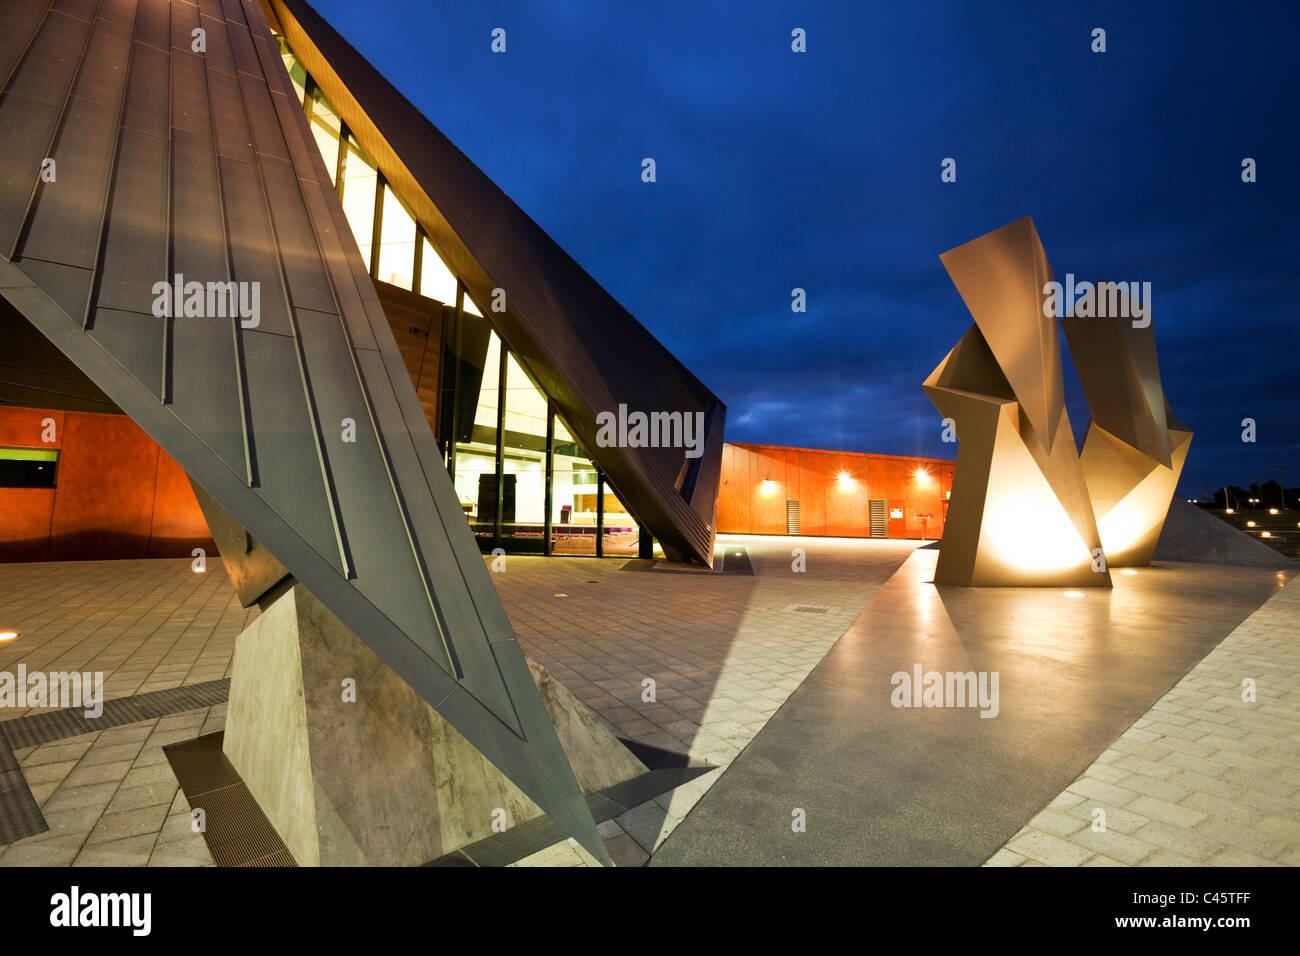 L'Albany du centre de divertissement. Albany, Australie occidentale, Australie Photo Stock